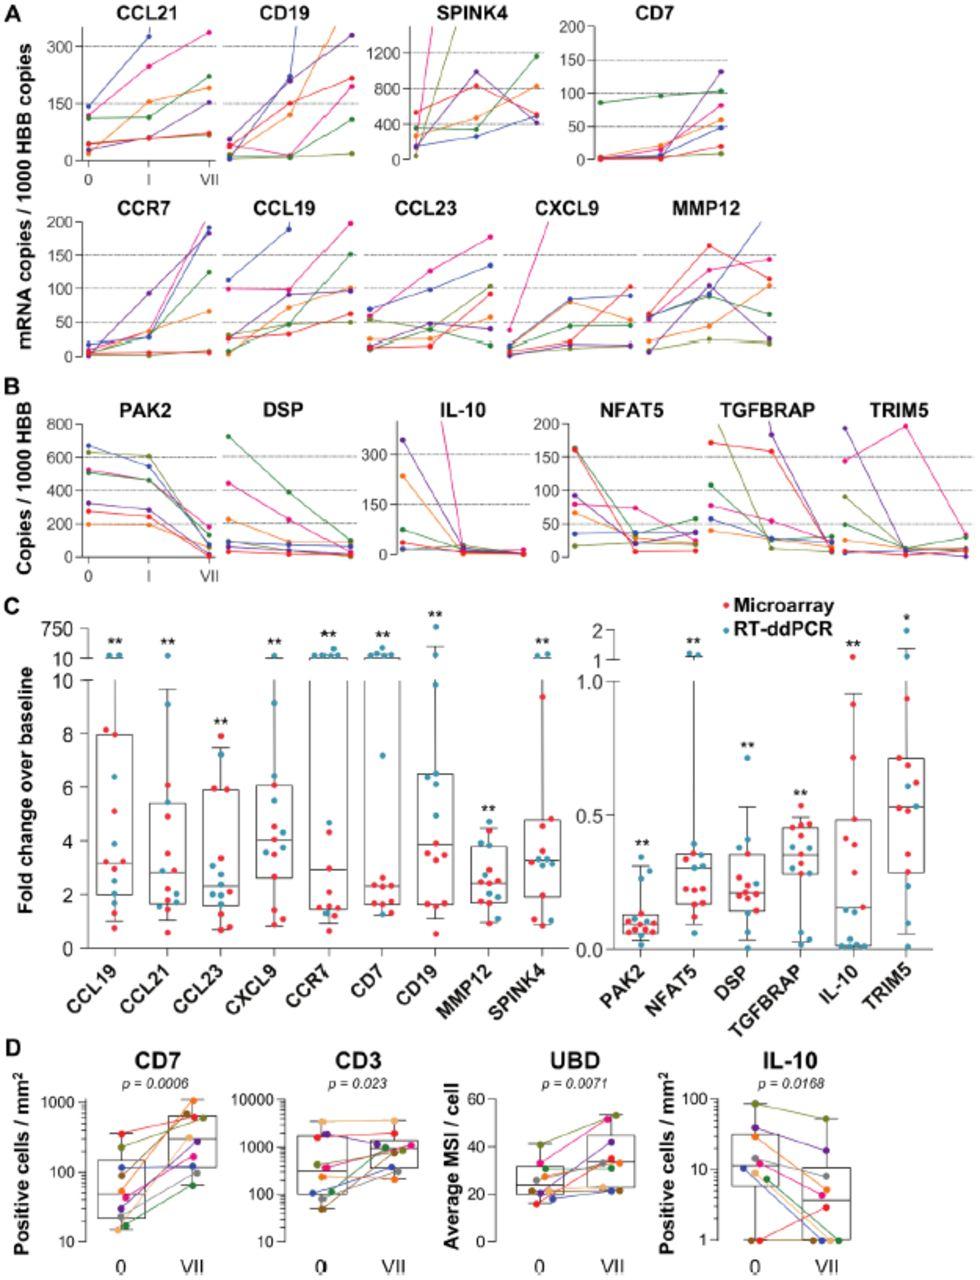 Mucosal Effects Of Tenofovir 1 Gel